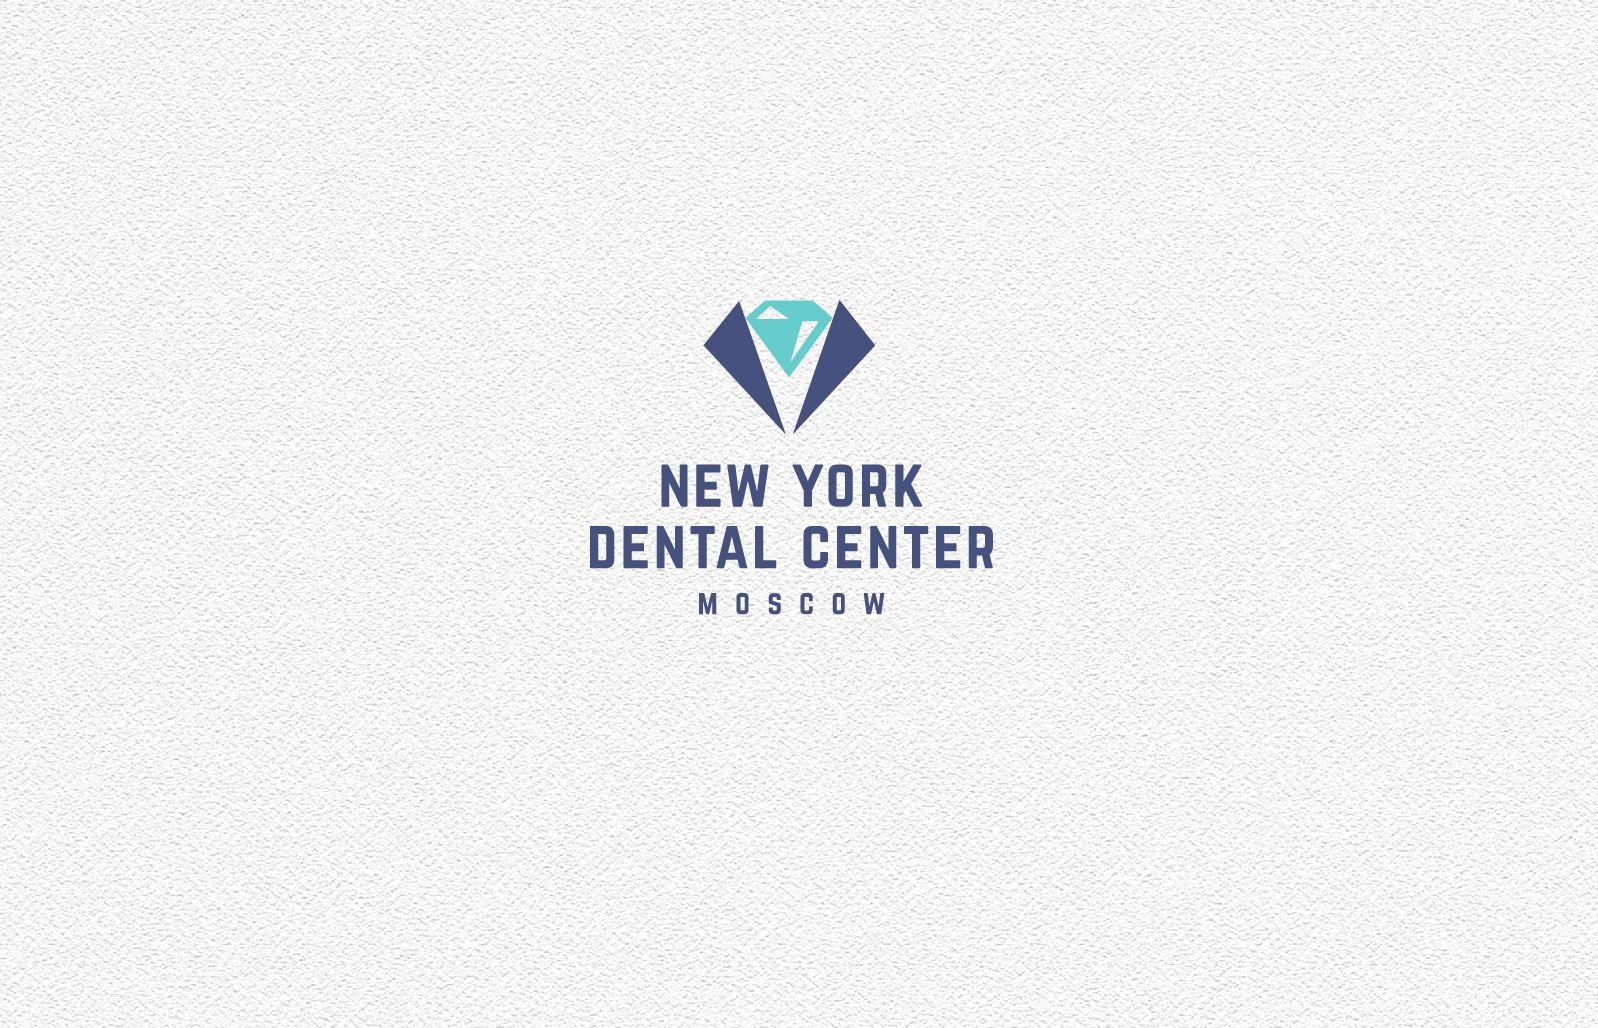 Логотип для New York Dental Center - дизайнер andblin61